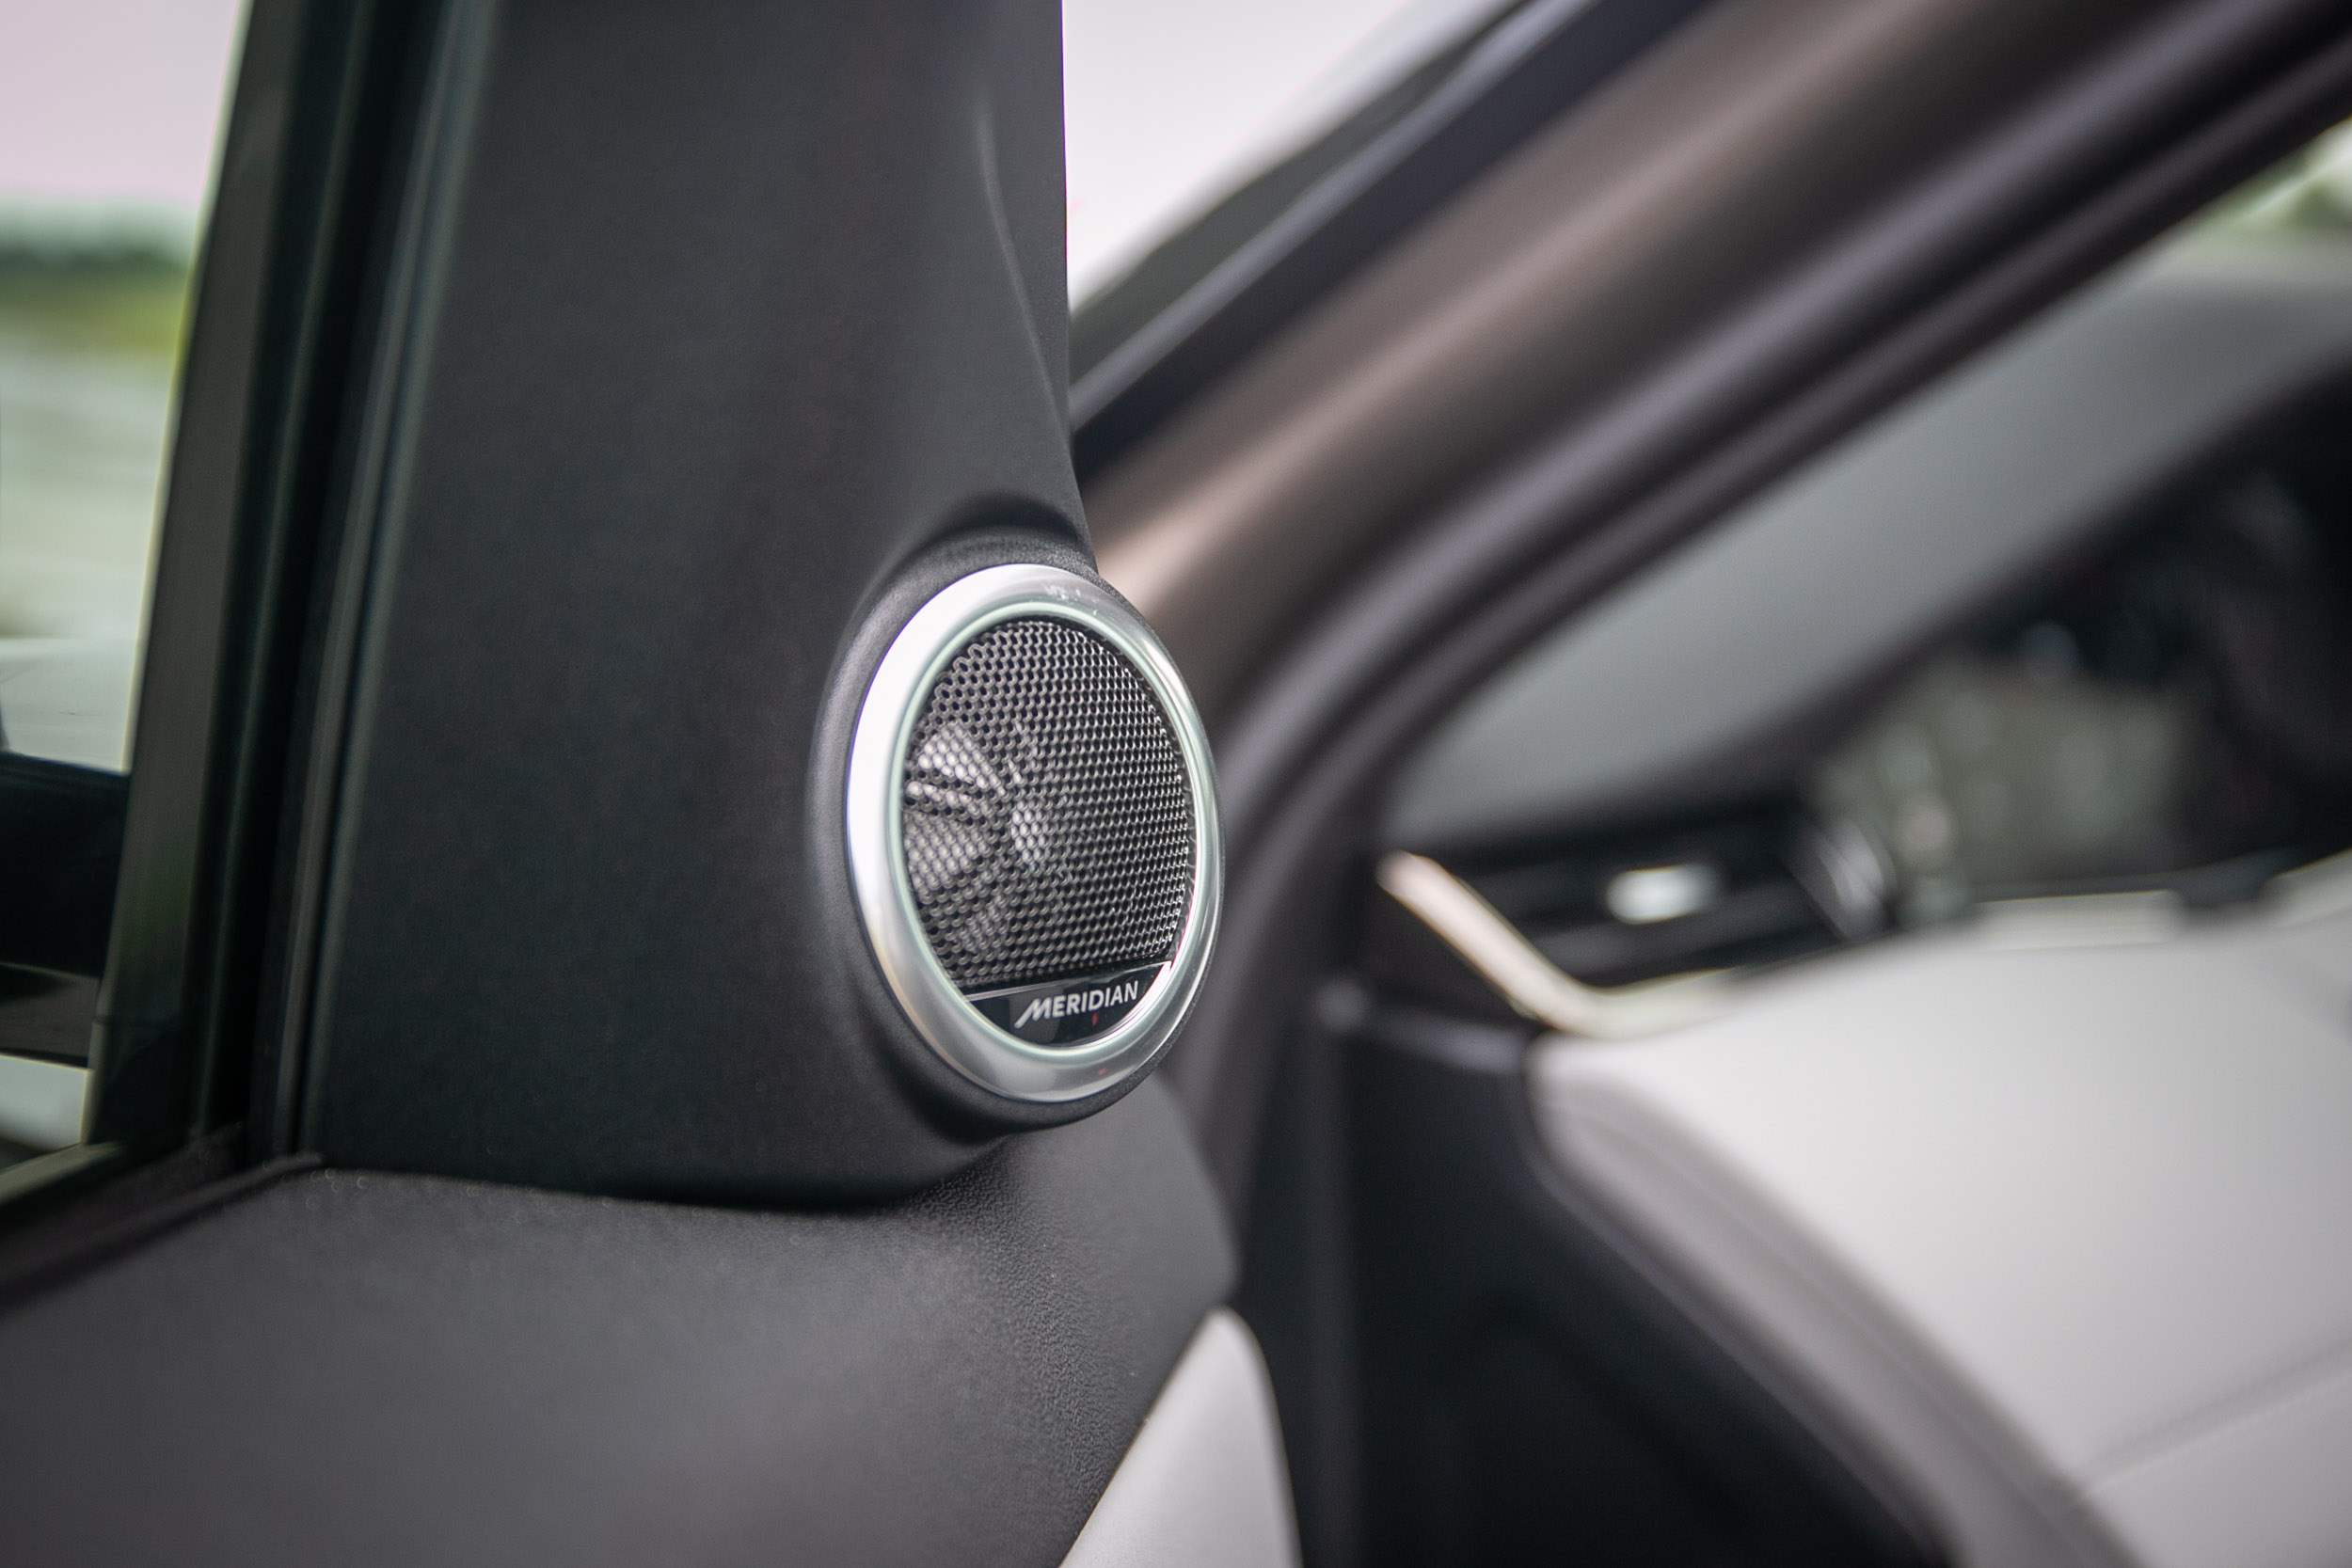 Meridian 400W 音響為頂級車型專屬。